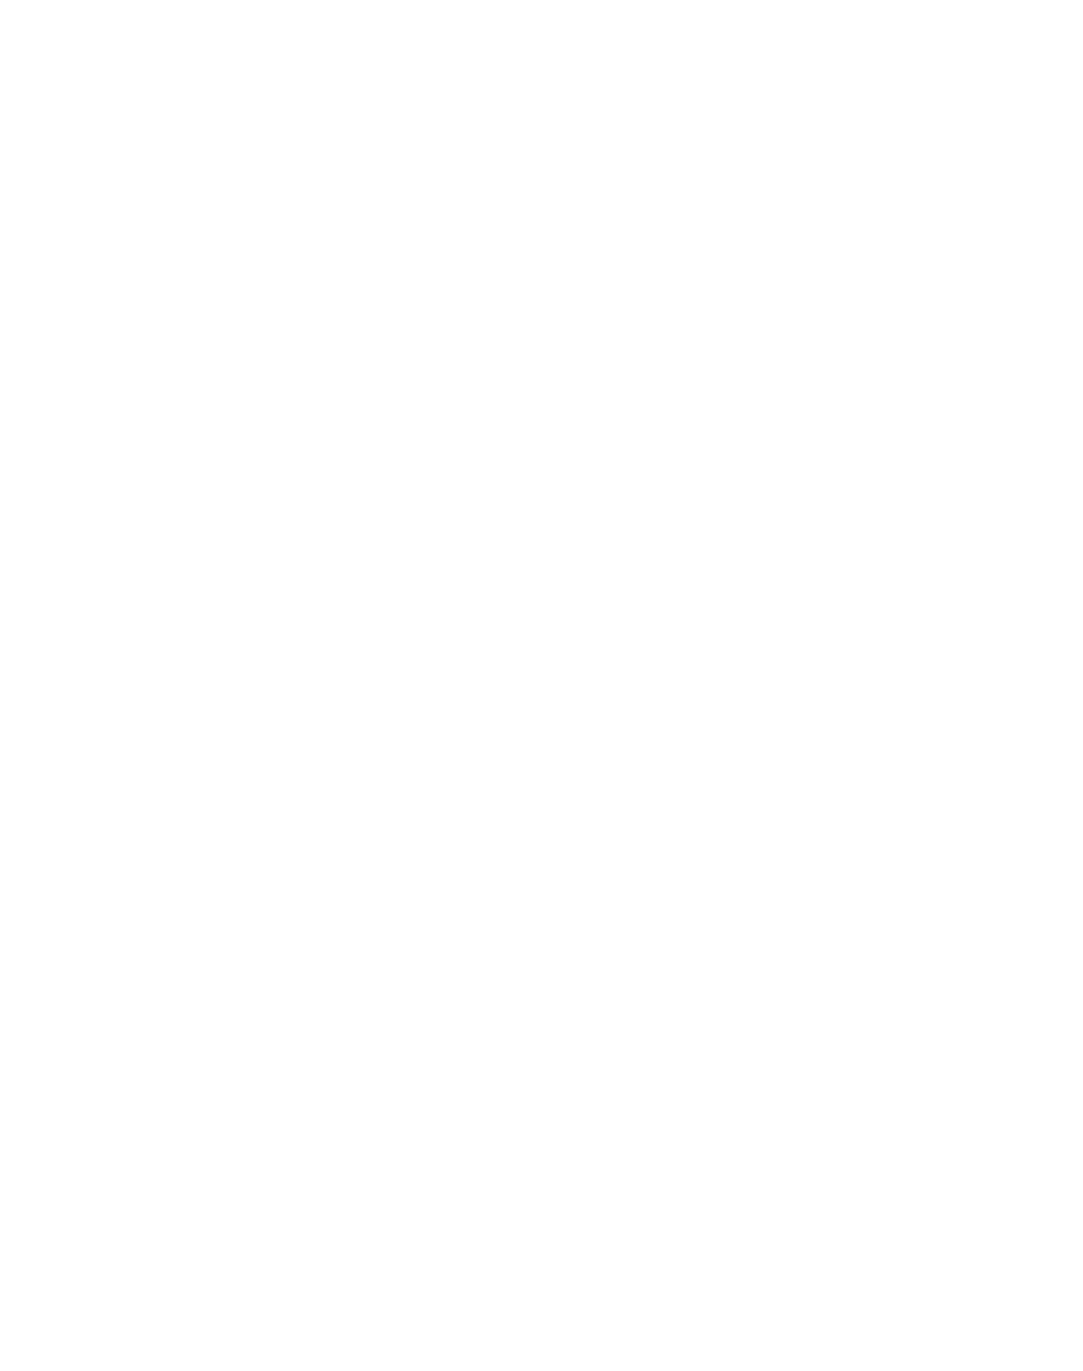 Hämeenlinnan kaupunki